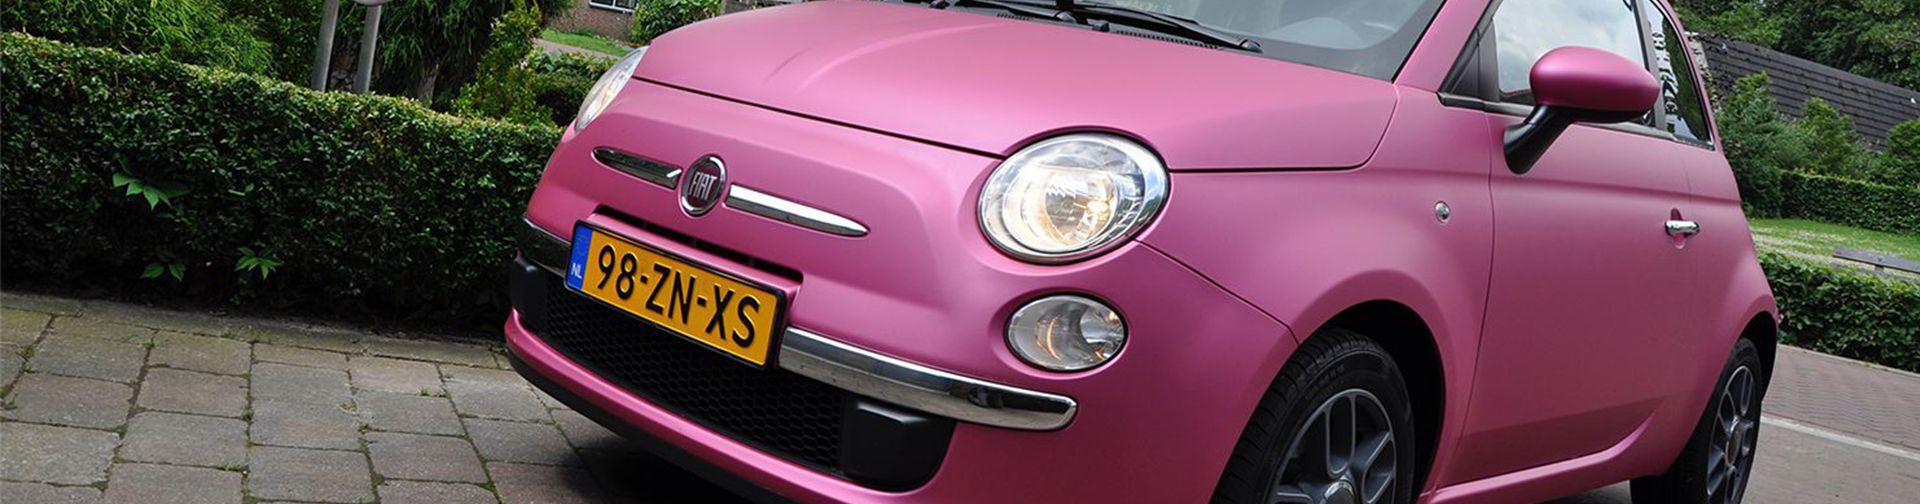 Carwrap Fiat 500 roze